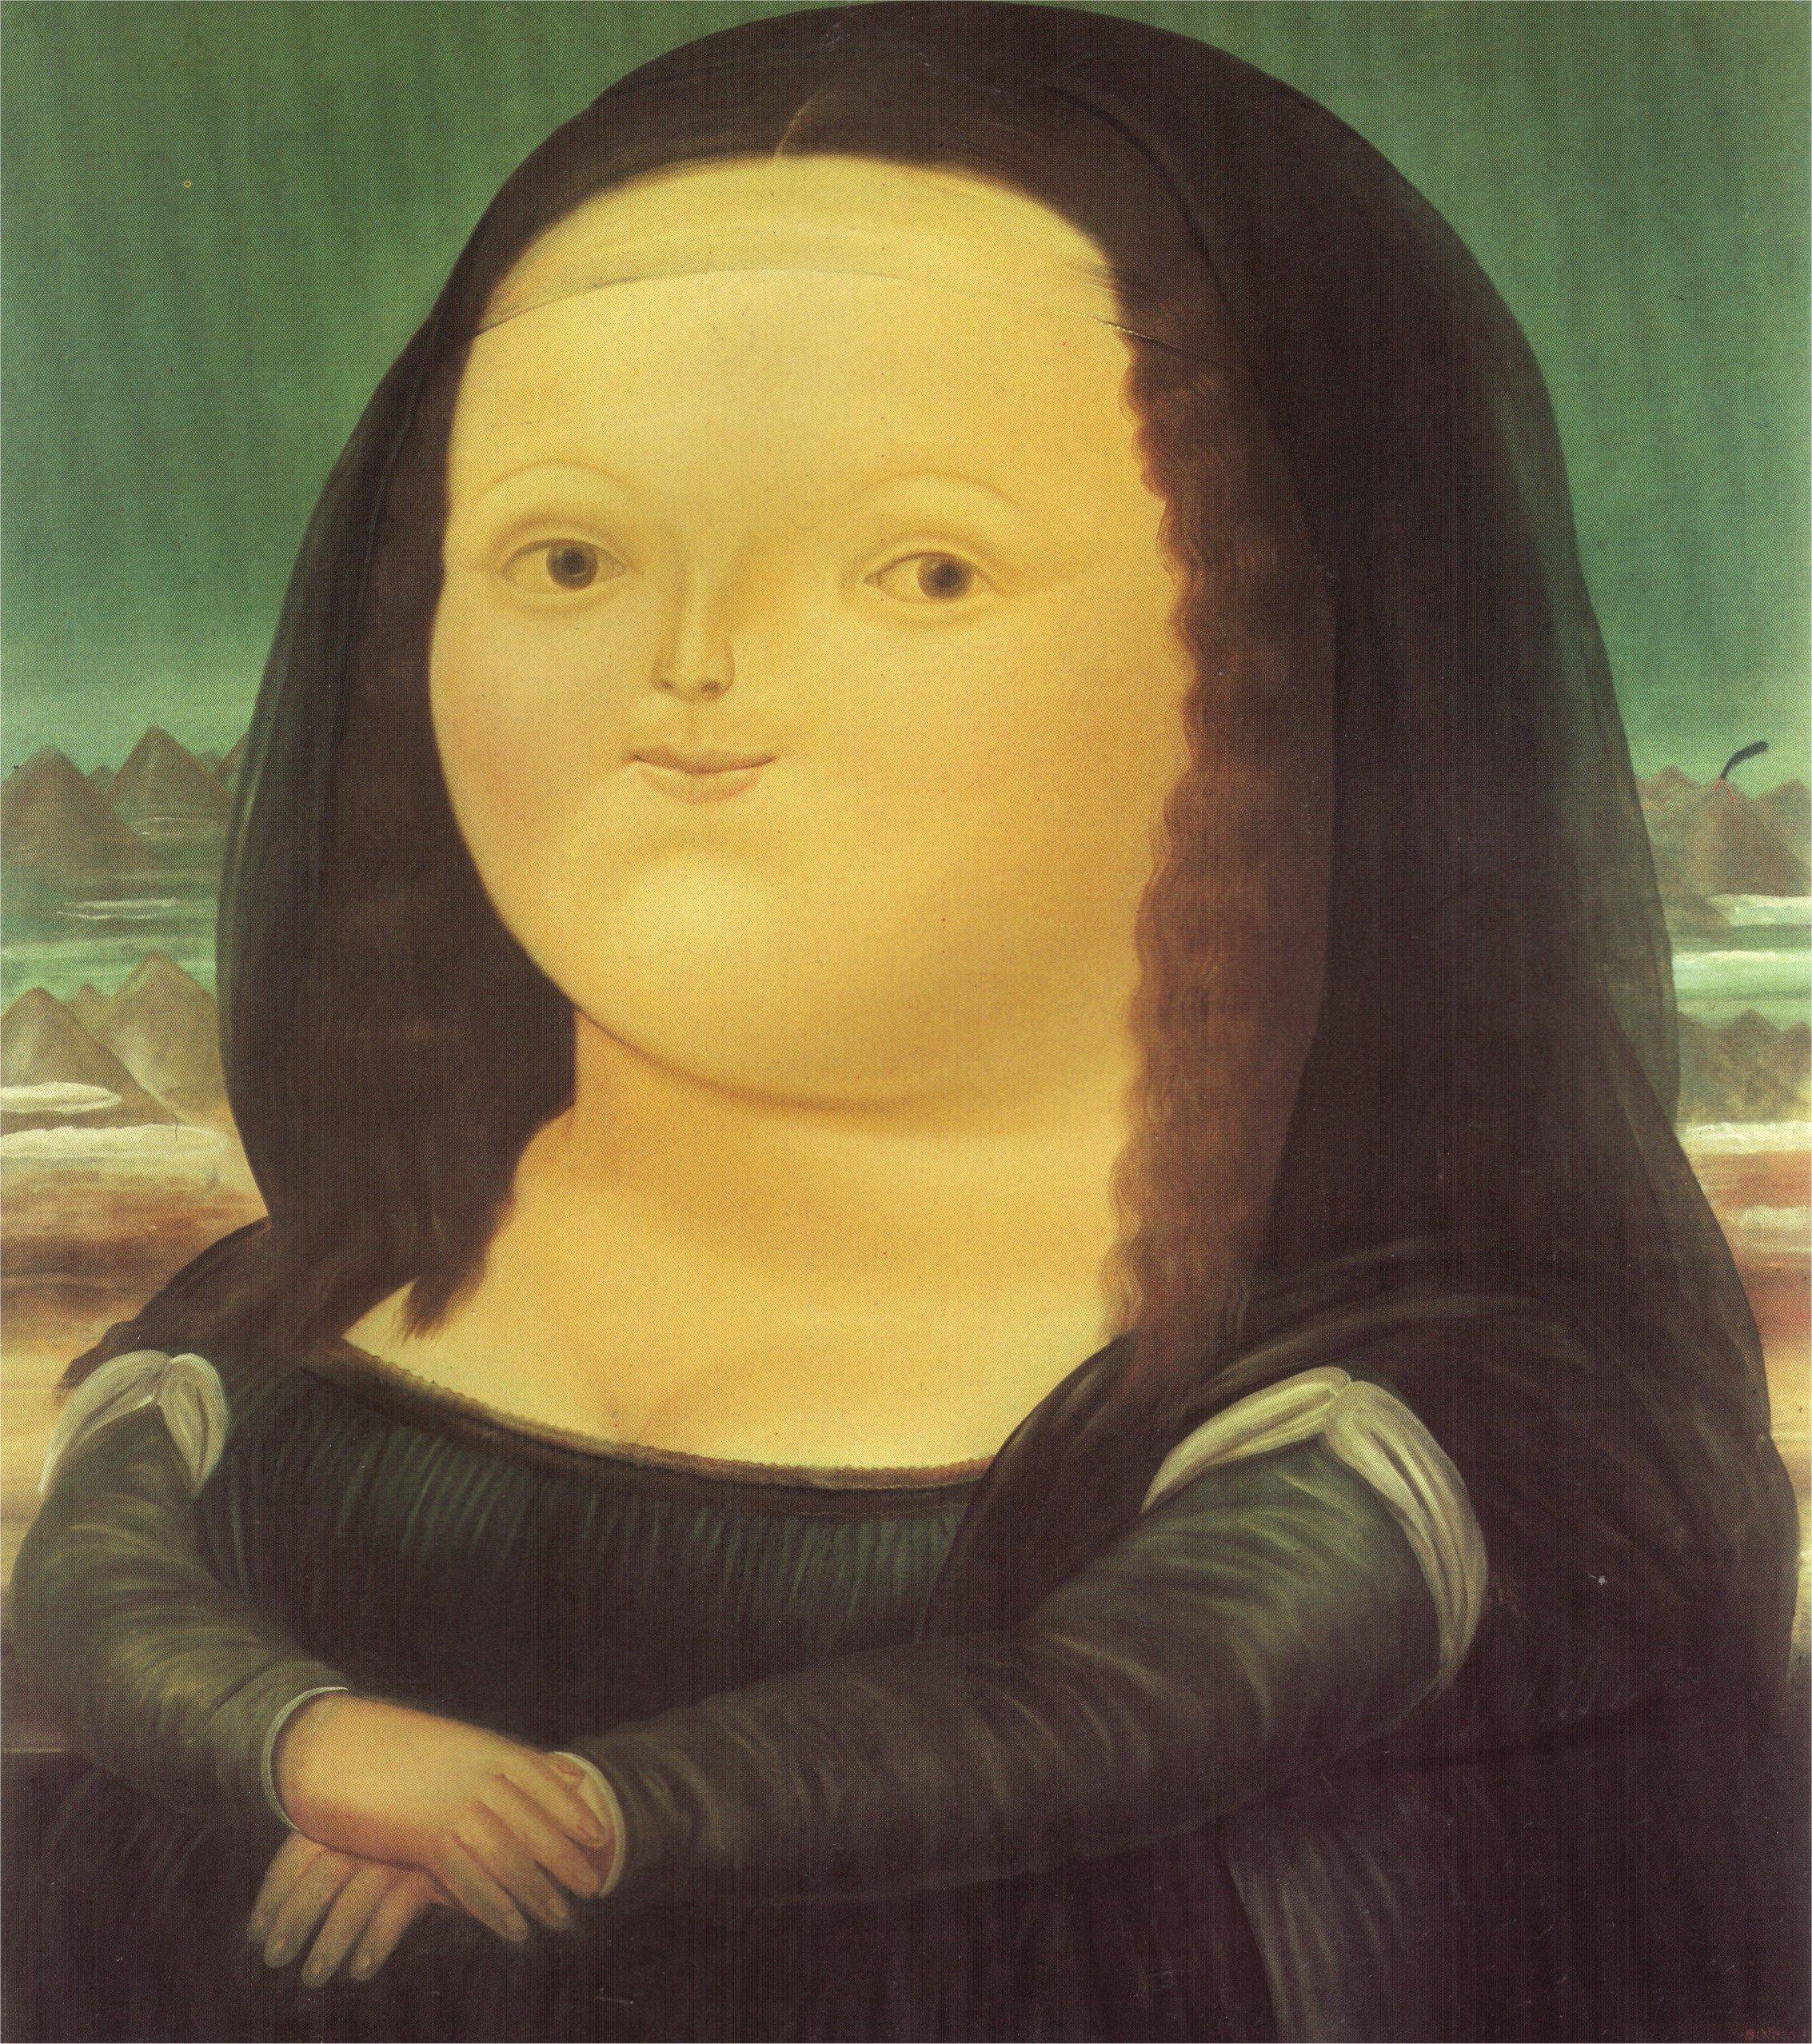 Populaire Mona Lisa, 1978 - Fernando Botero - WikiArt.org GU85